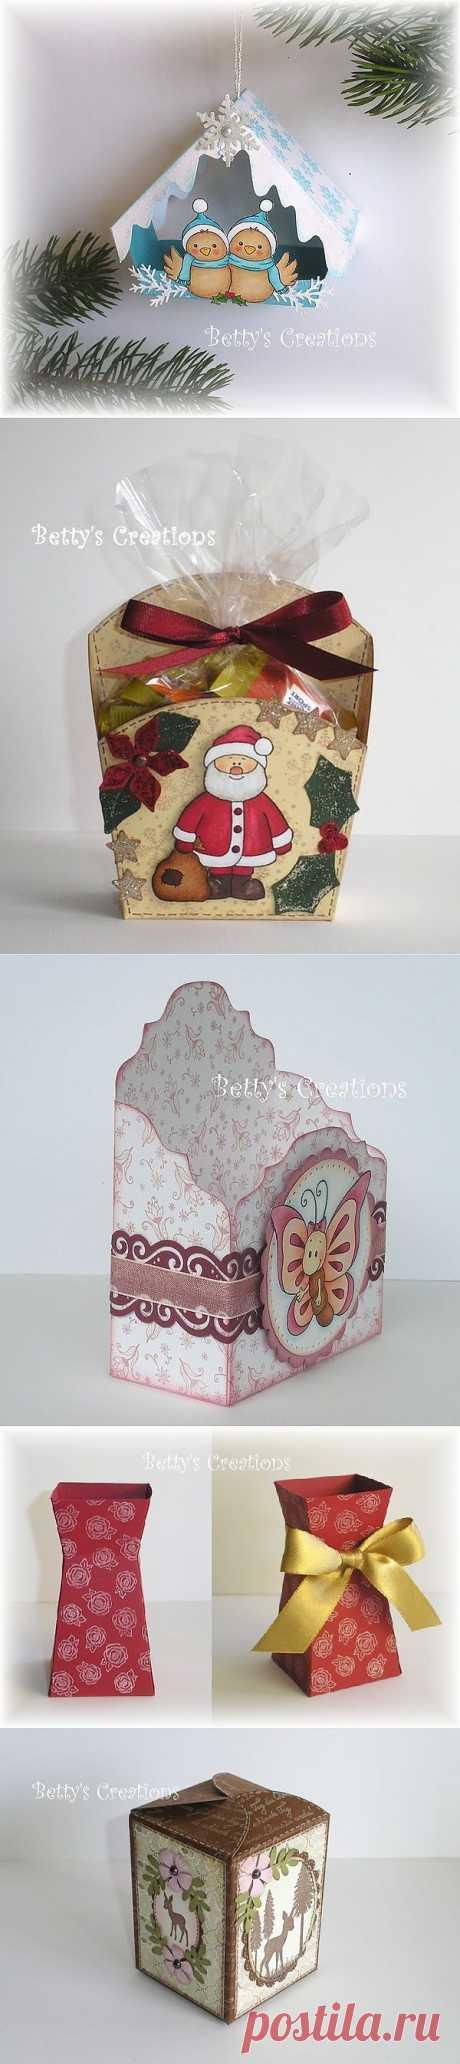 Коробочки, корзинки и новогодние игрушки из картона. Шаблоны.